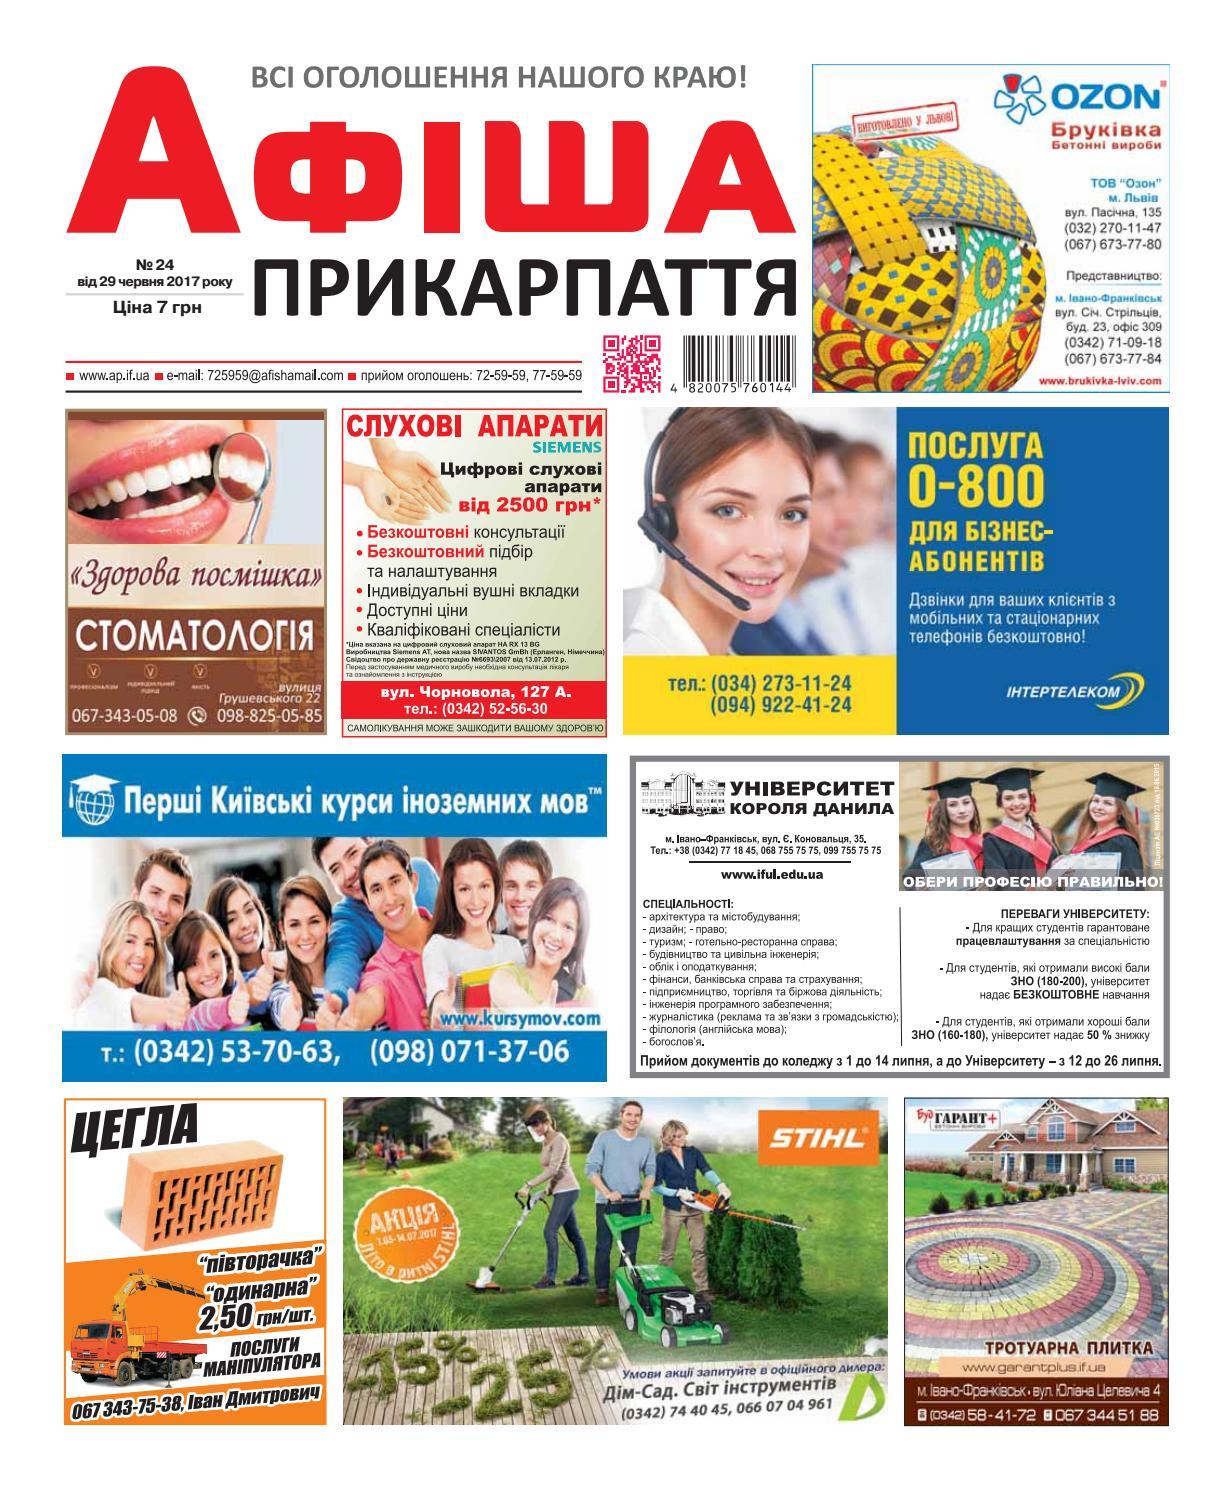 Афіша Прикарпаття 24 by Olya Olya - issuu e0148f00a0120